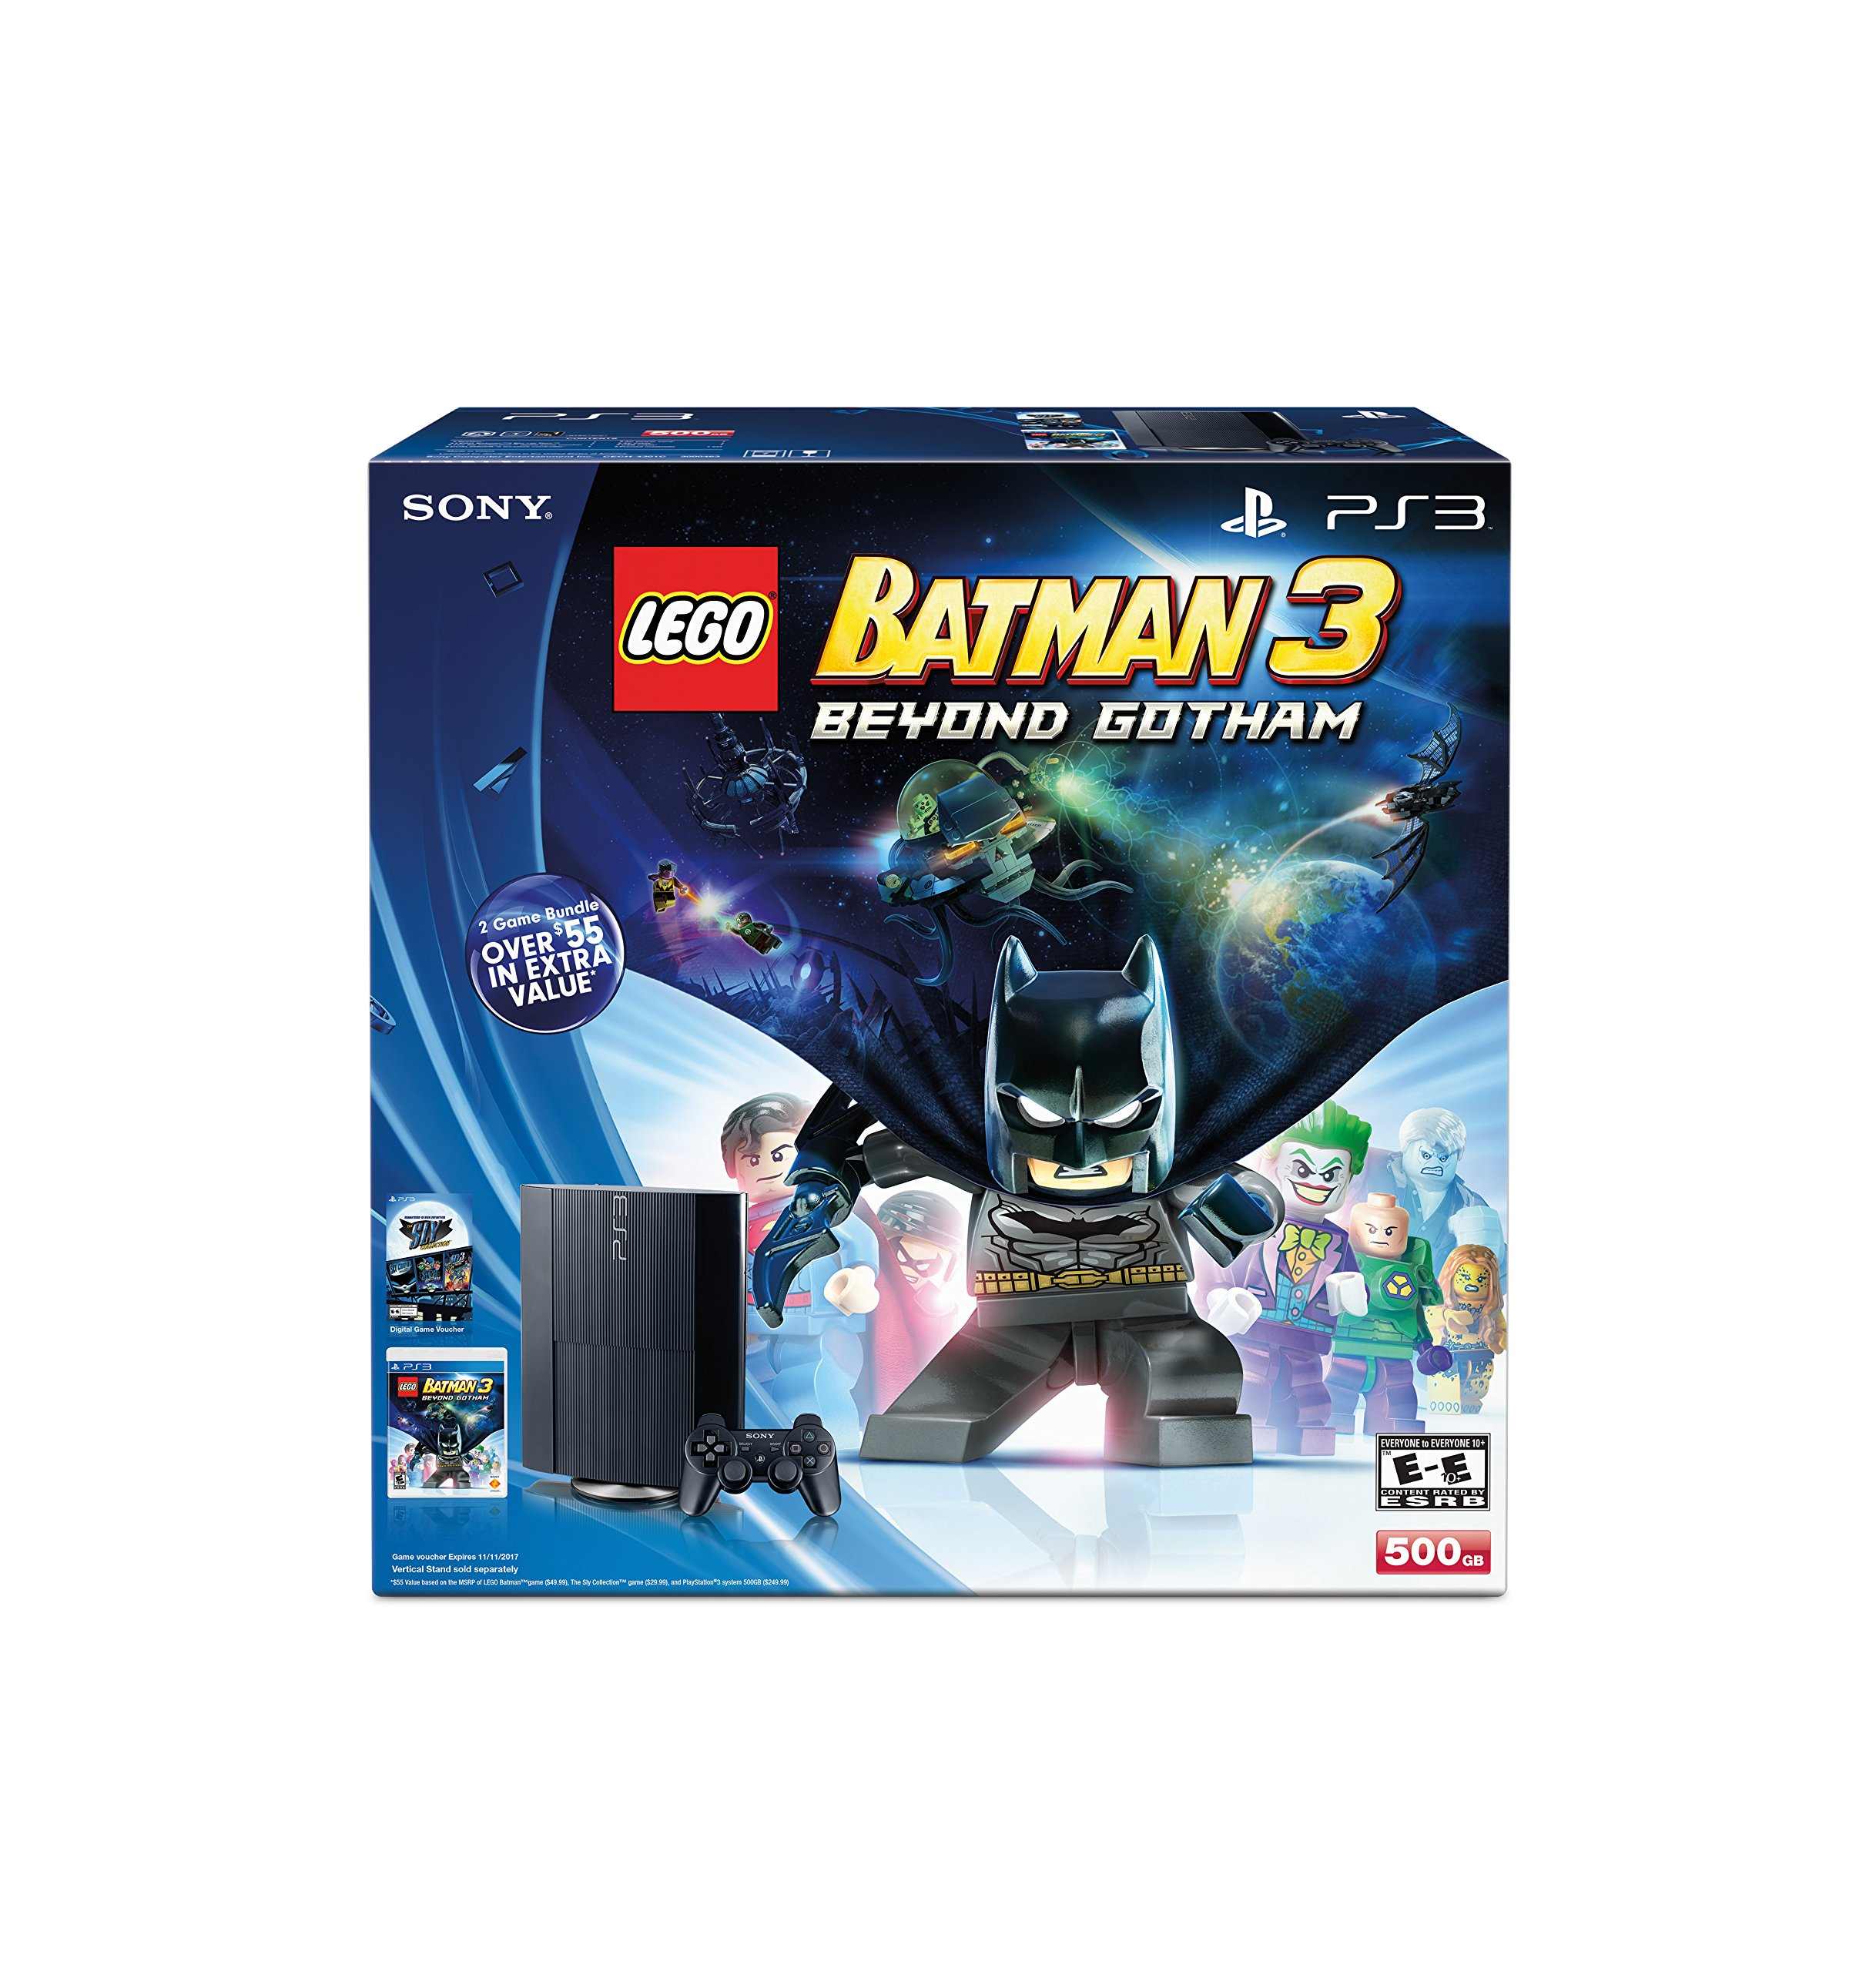 Lego Batman 3: Beyond Gotham + The Sly Collection PlayStation 3 500GB Bundle by Sony